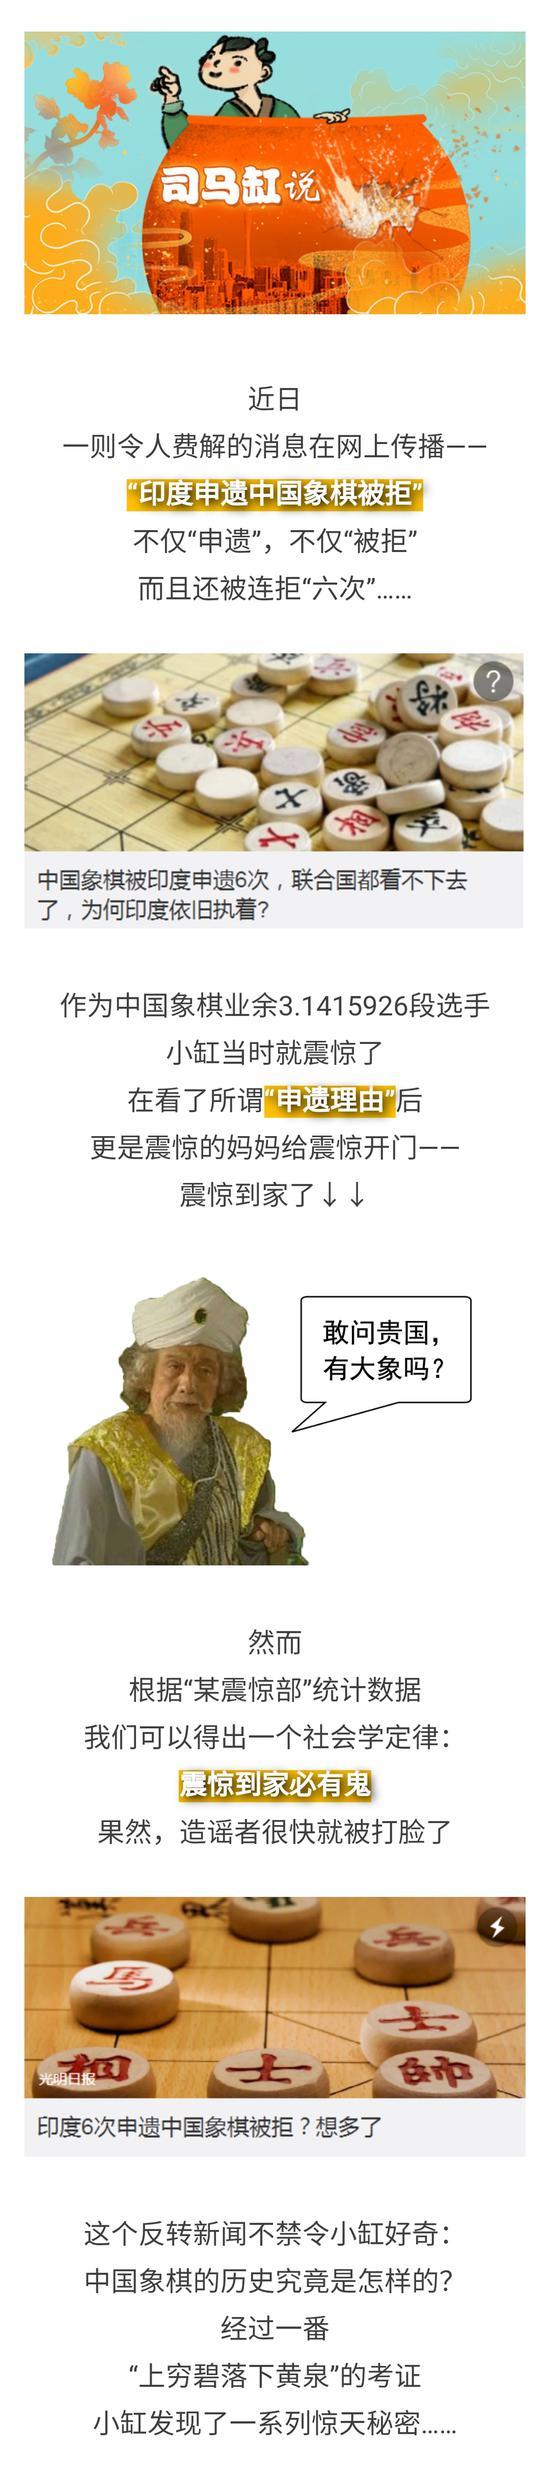 http://www.5496565.live/guojiguanzhu/335599.html